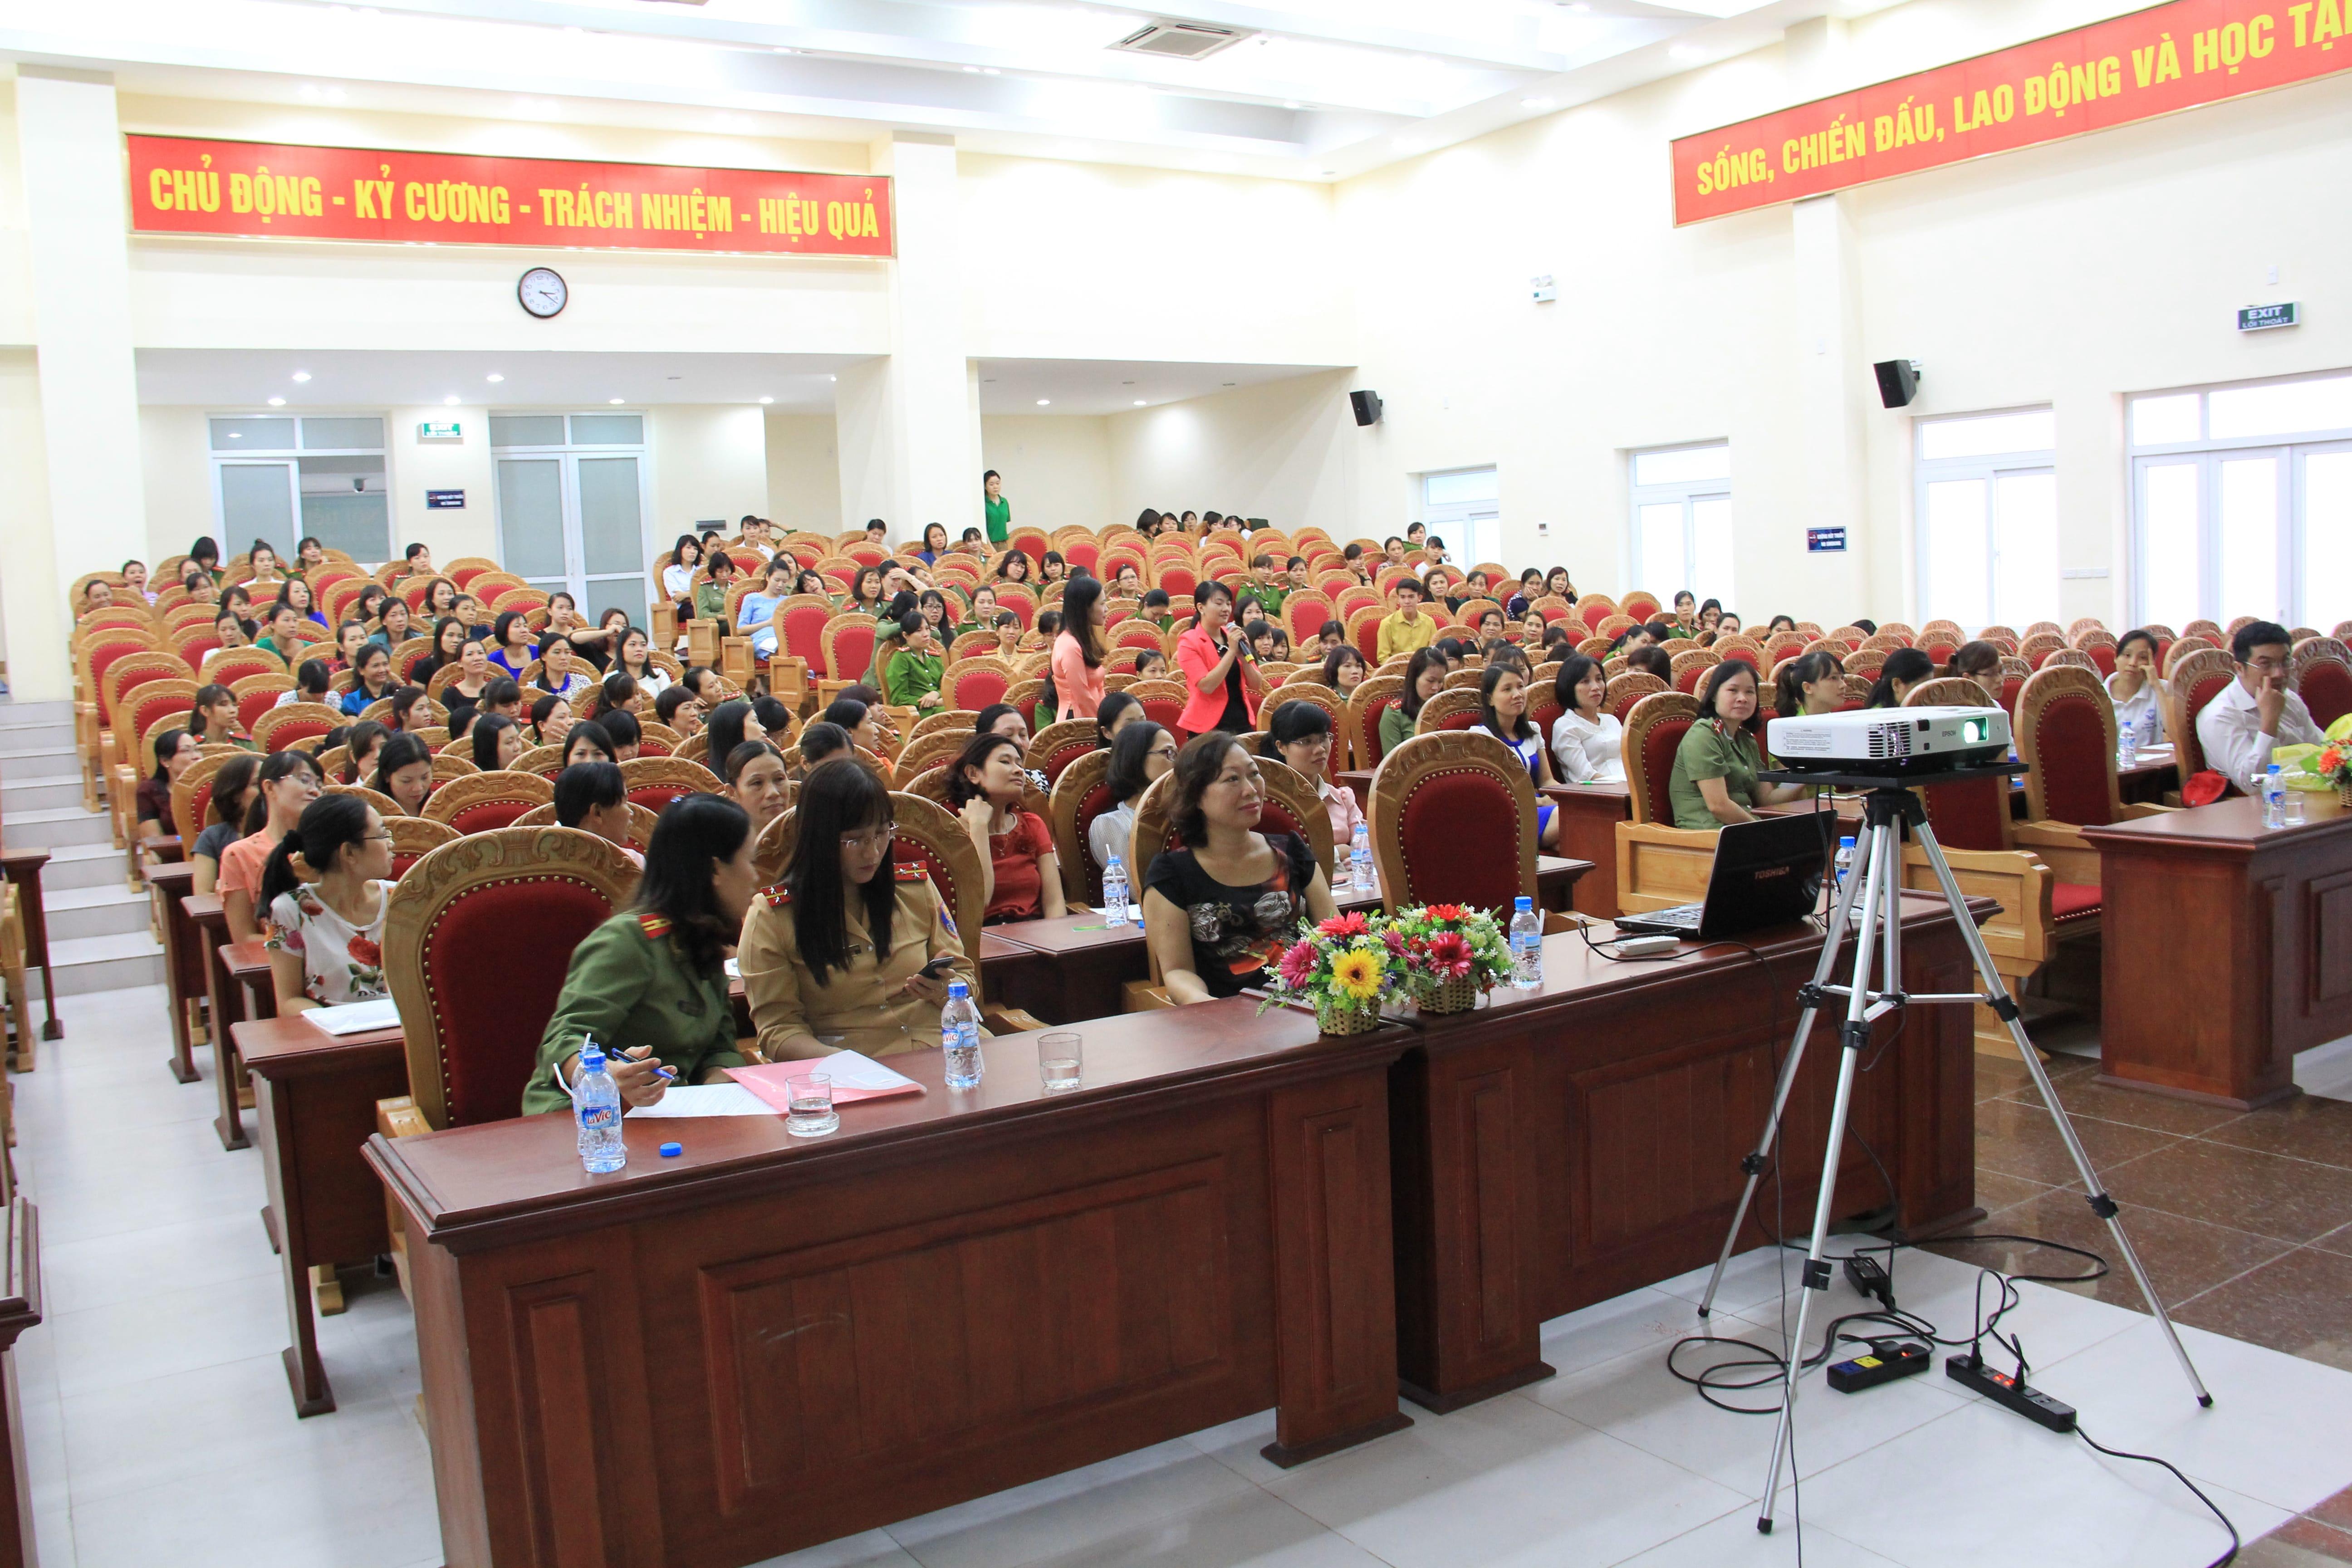 Tu-van-cham-soc-suc-khoe-cho-300-phu-nu-cong-an-tinh-Hung-Yen